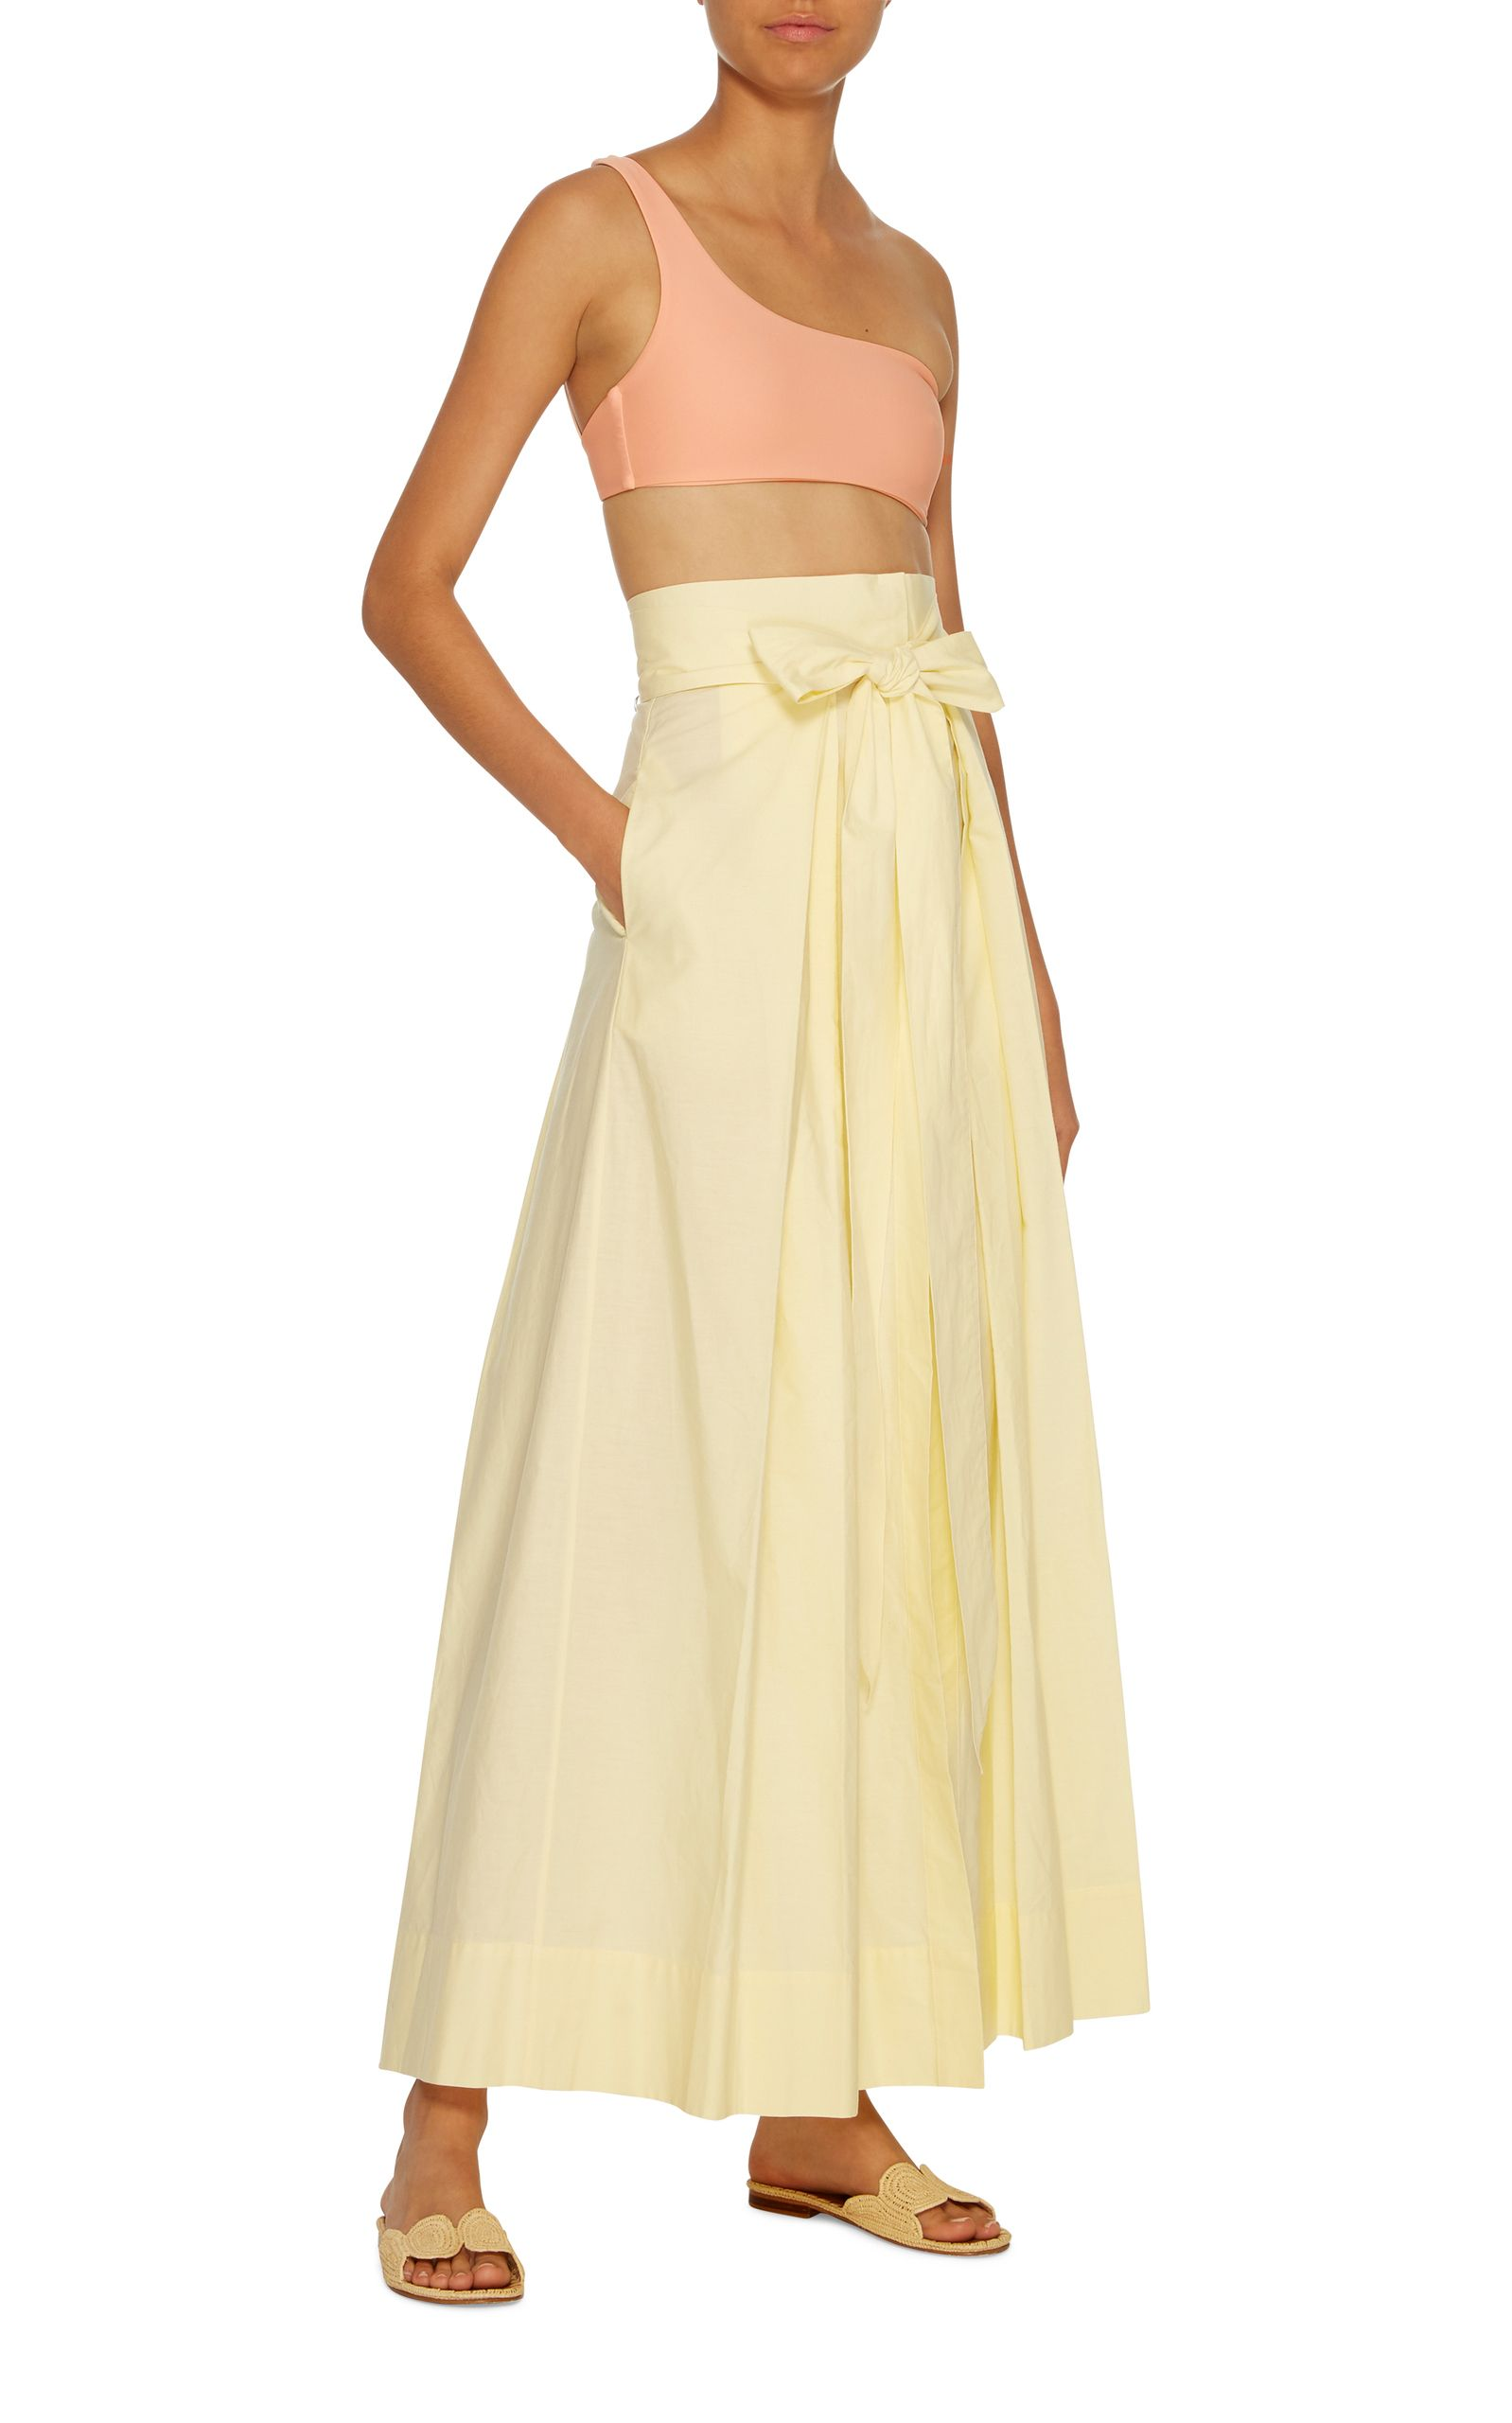 1ac14c32d Avedon Days Maxi Skirt | Great Skirts | Skirts, Fashion, Dresses